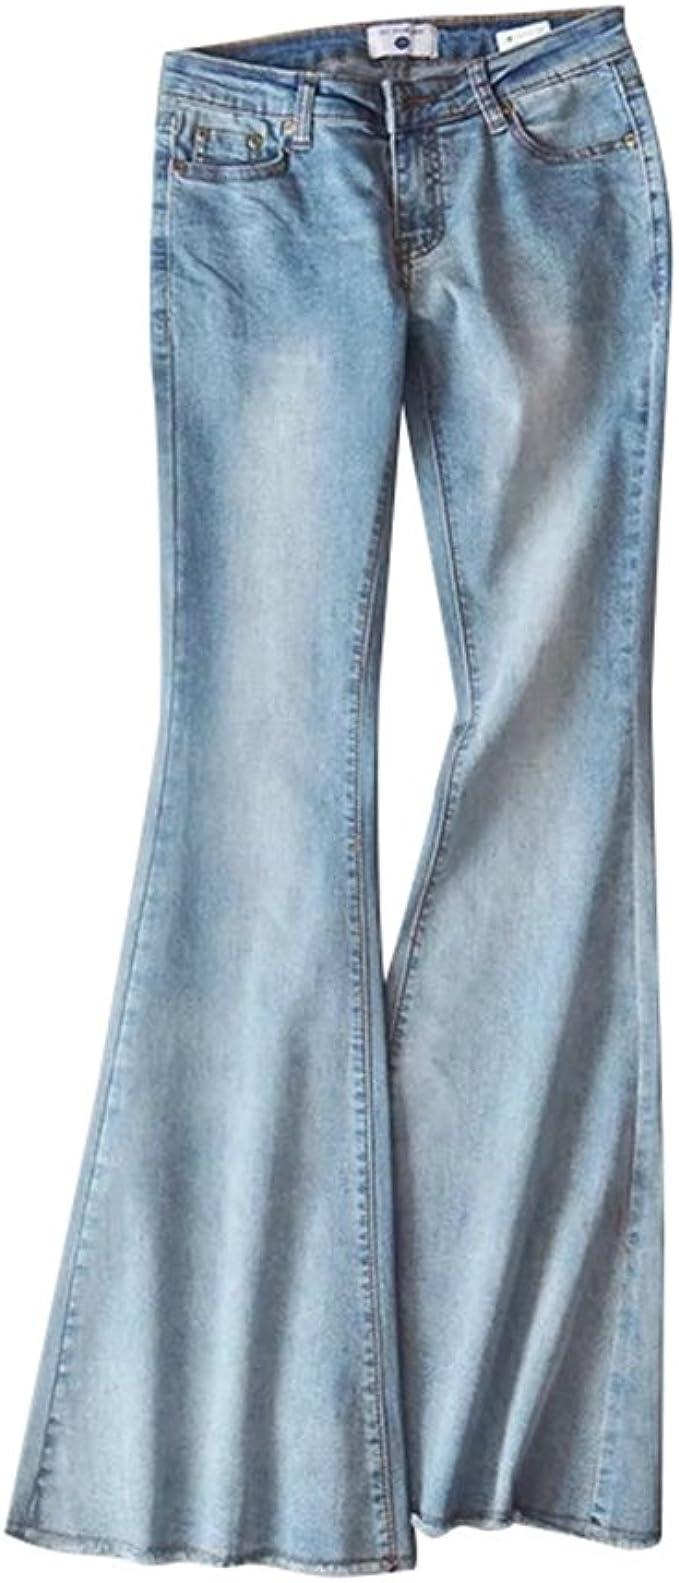 ZKOO Jeans Donna Bootcut Pantaloni Jeans a Zampa Casuale Denim Pantaloni